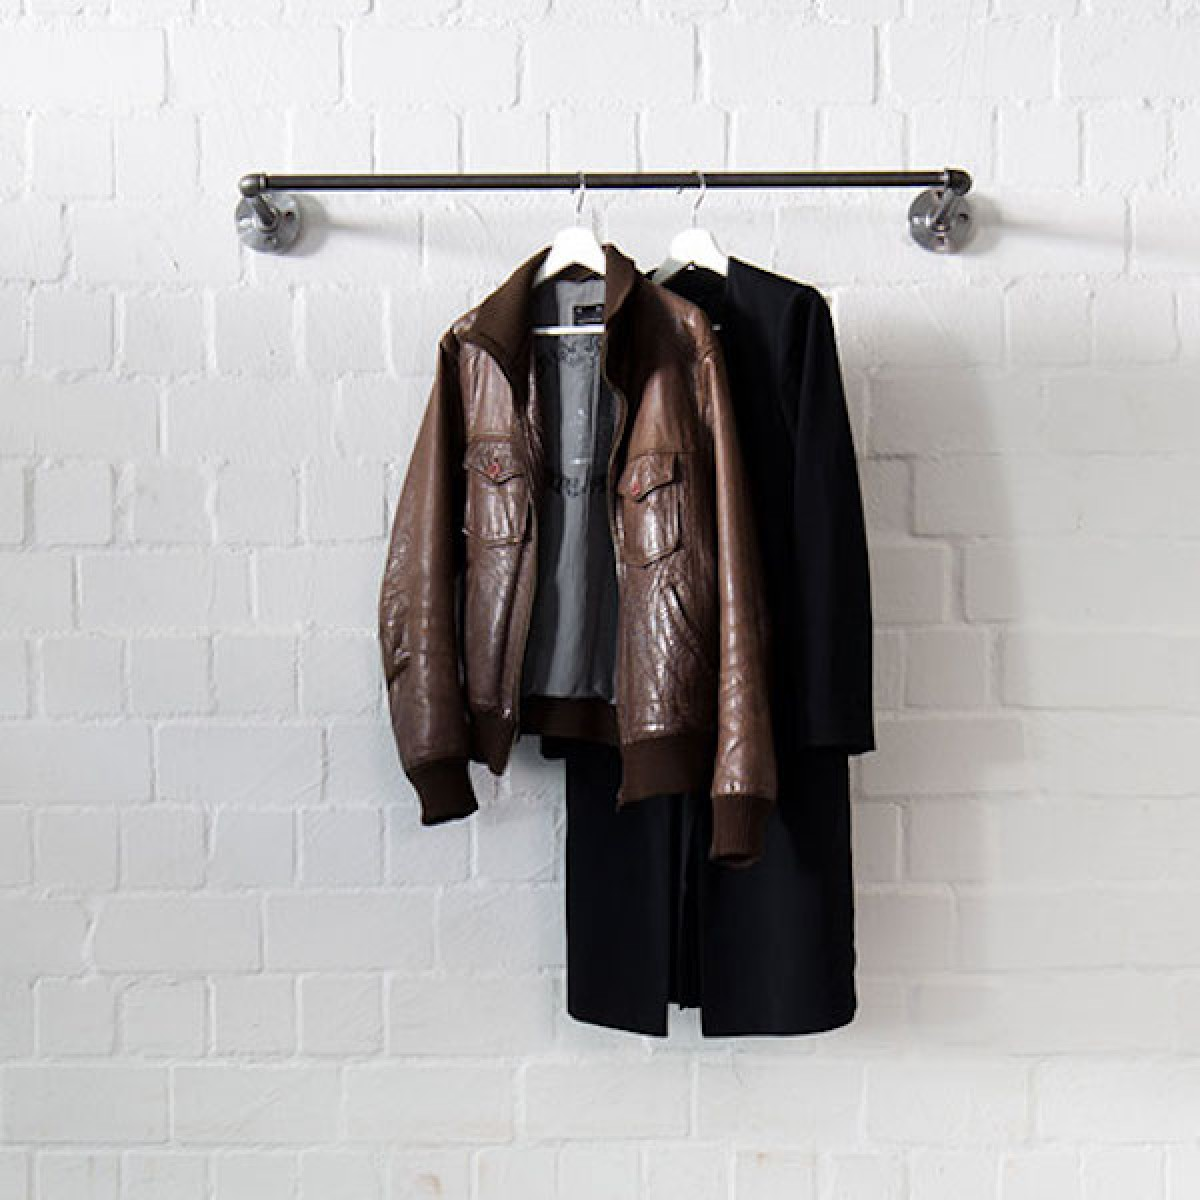 various Industrial Style Kleiderstange · Wandgarderobe im Industriedesign SOLID LINE - Tiefe 25 cm